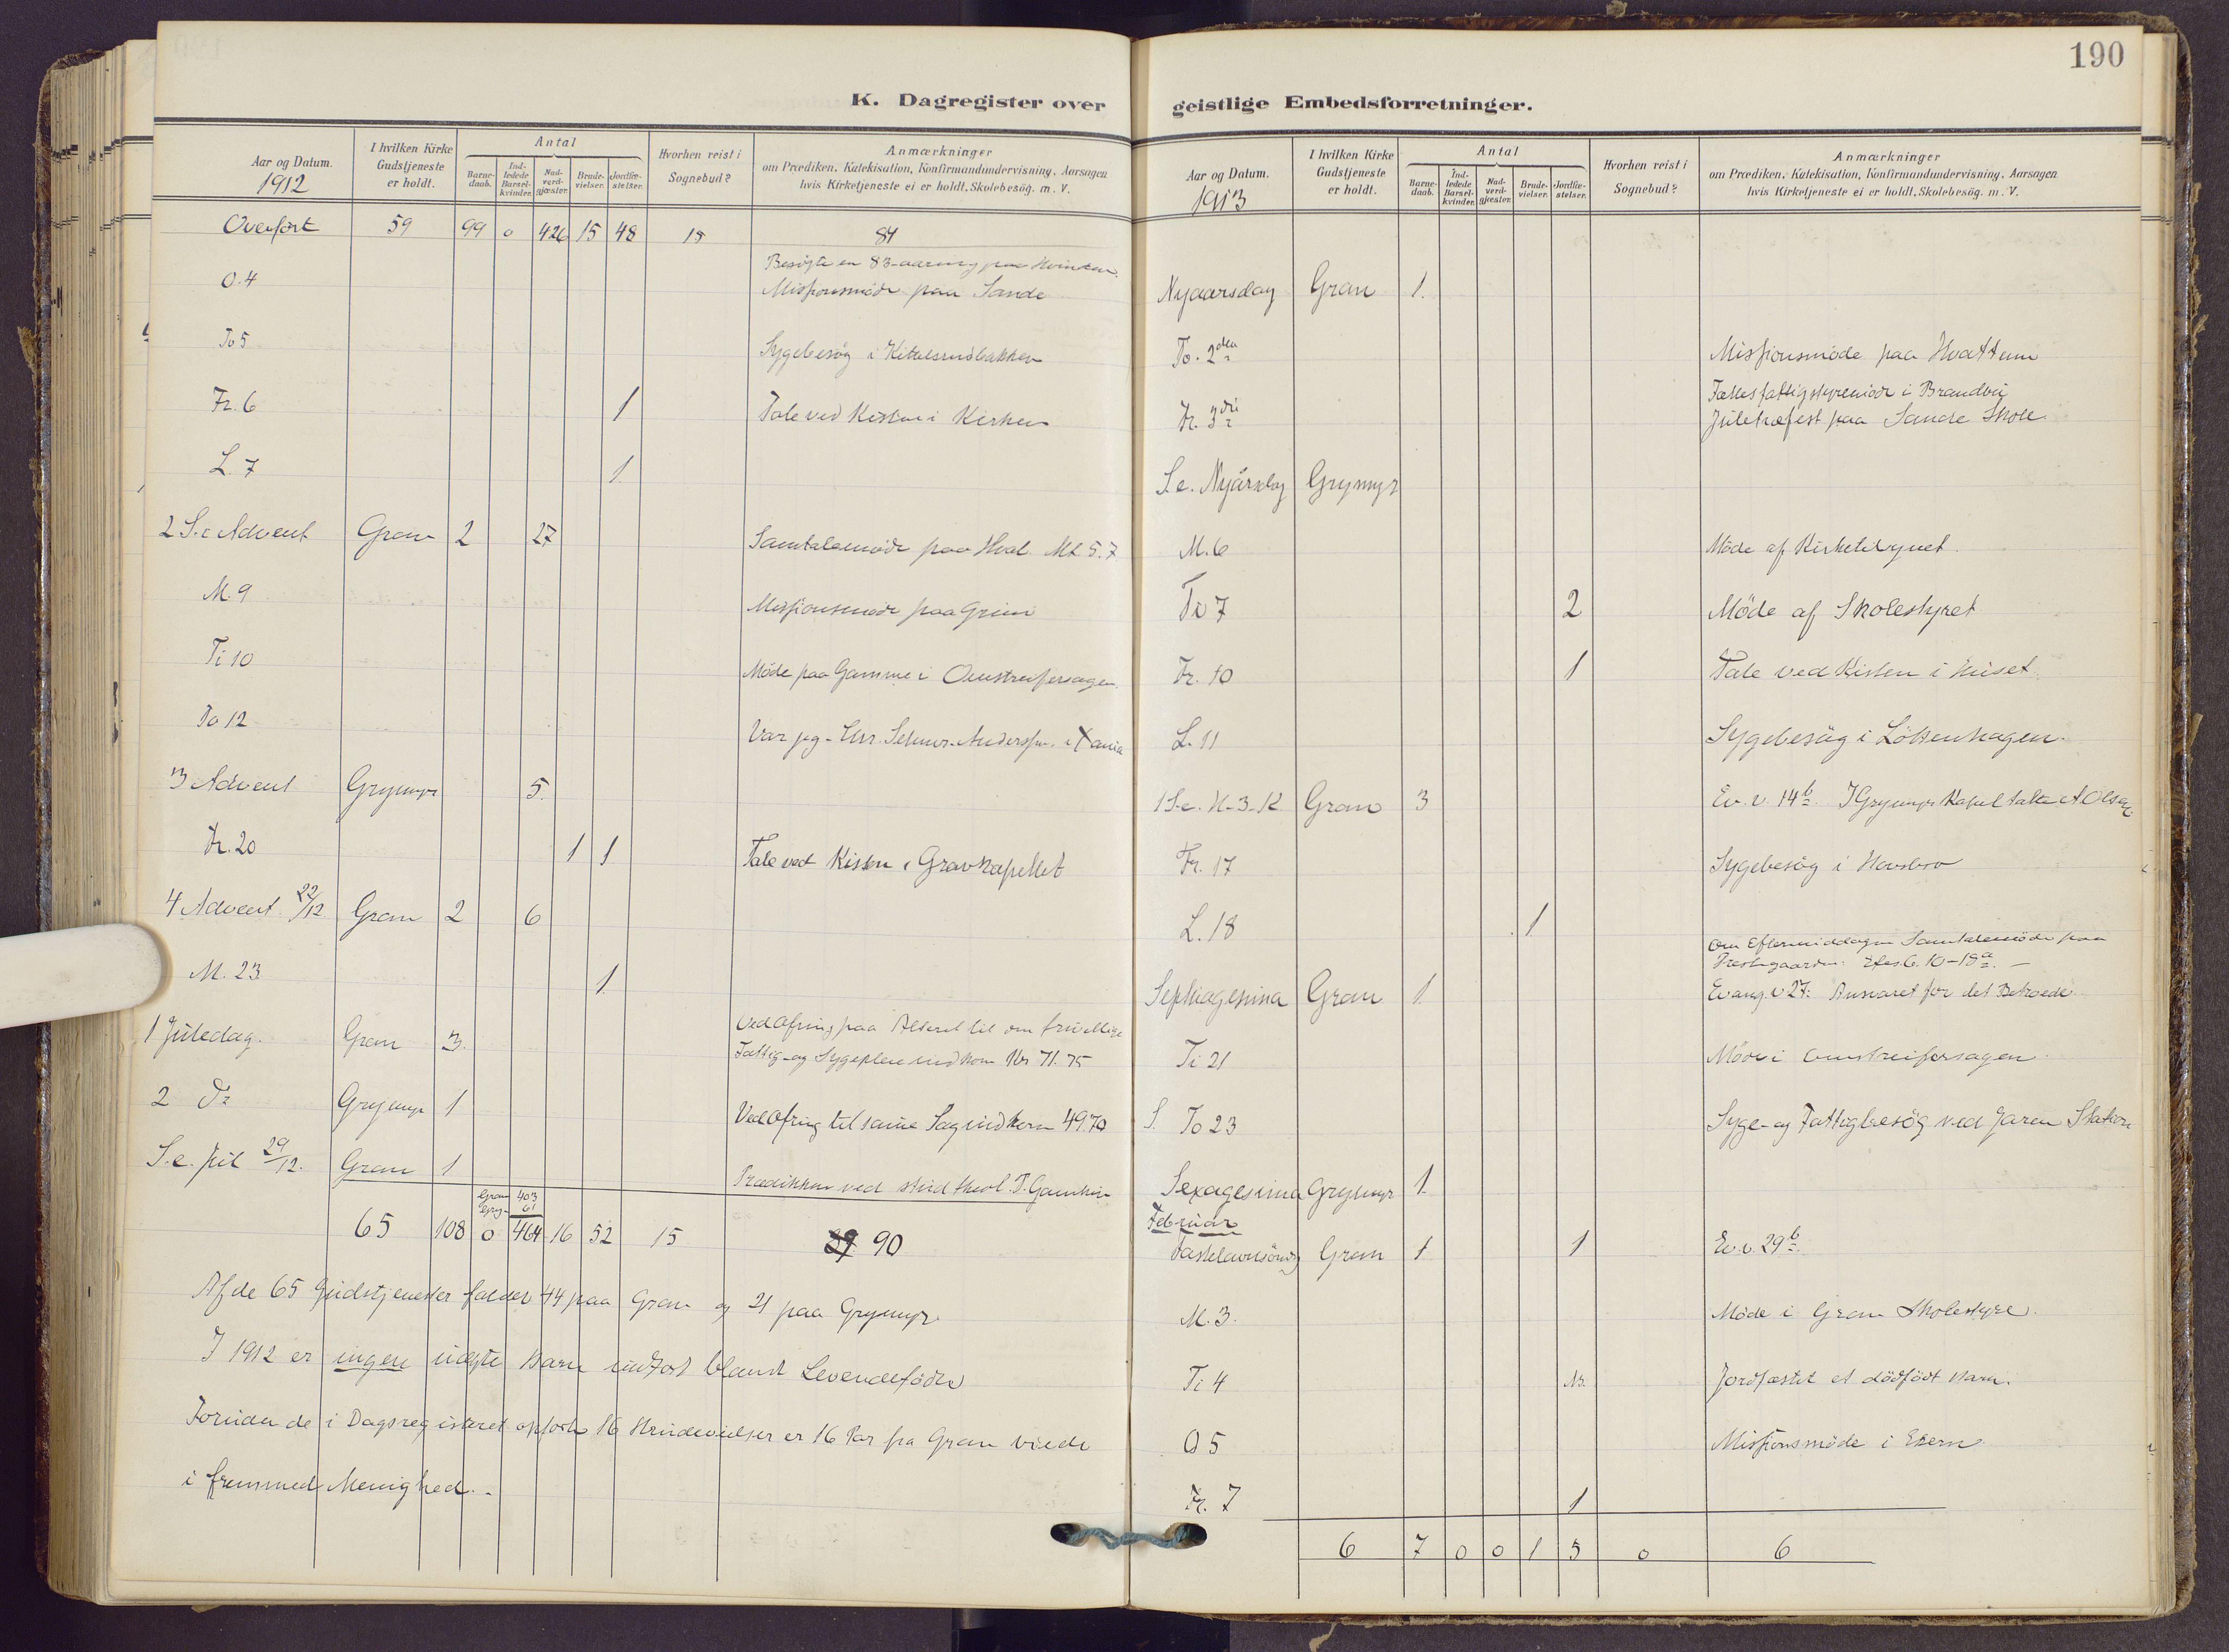 SAH, Gran prestekontor, Ministerialbok nr. 22, 1908-1918, s. 190